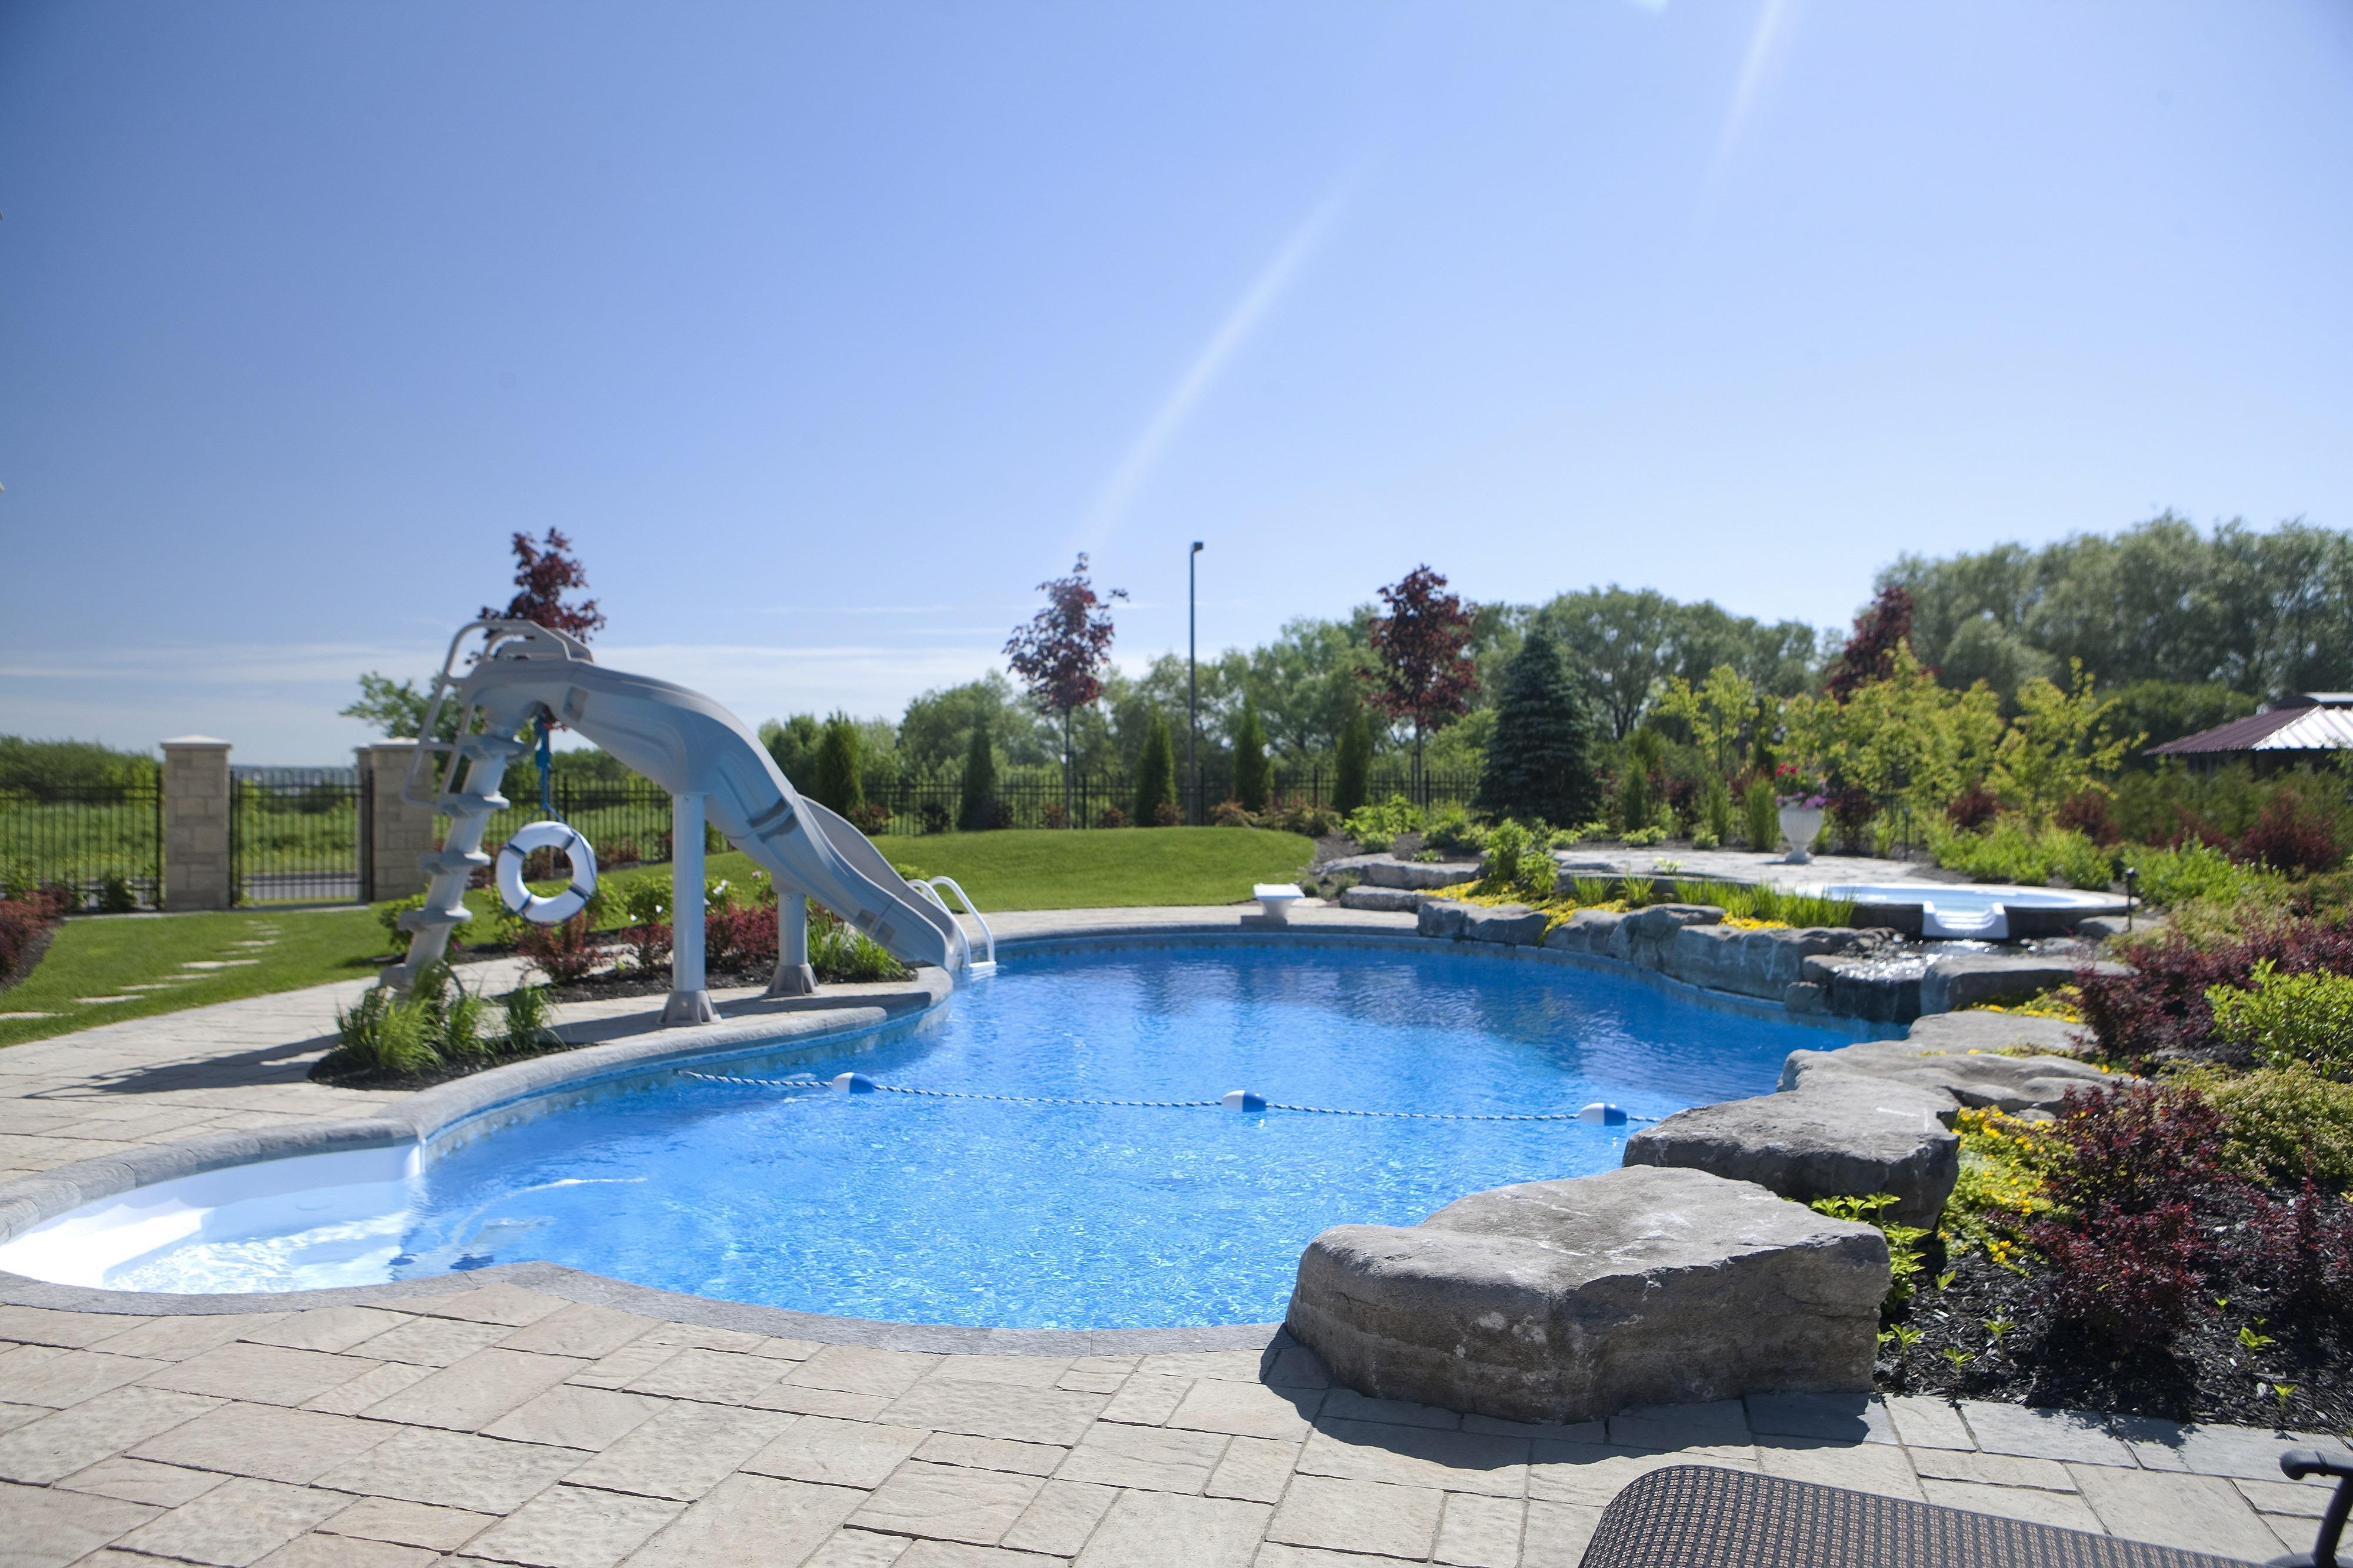 Installation de piscine concept piscine design for Piscine design concept